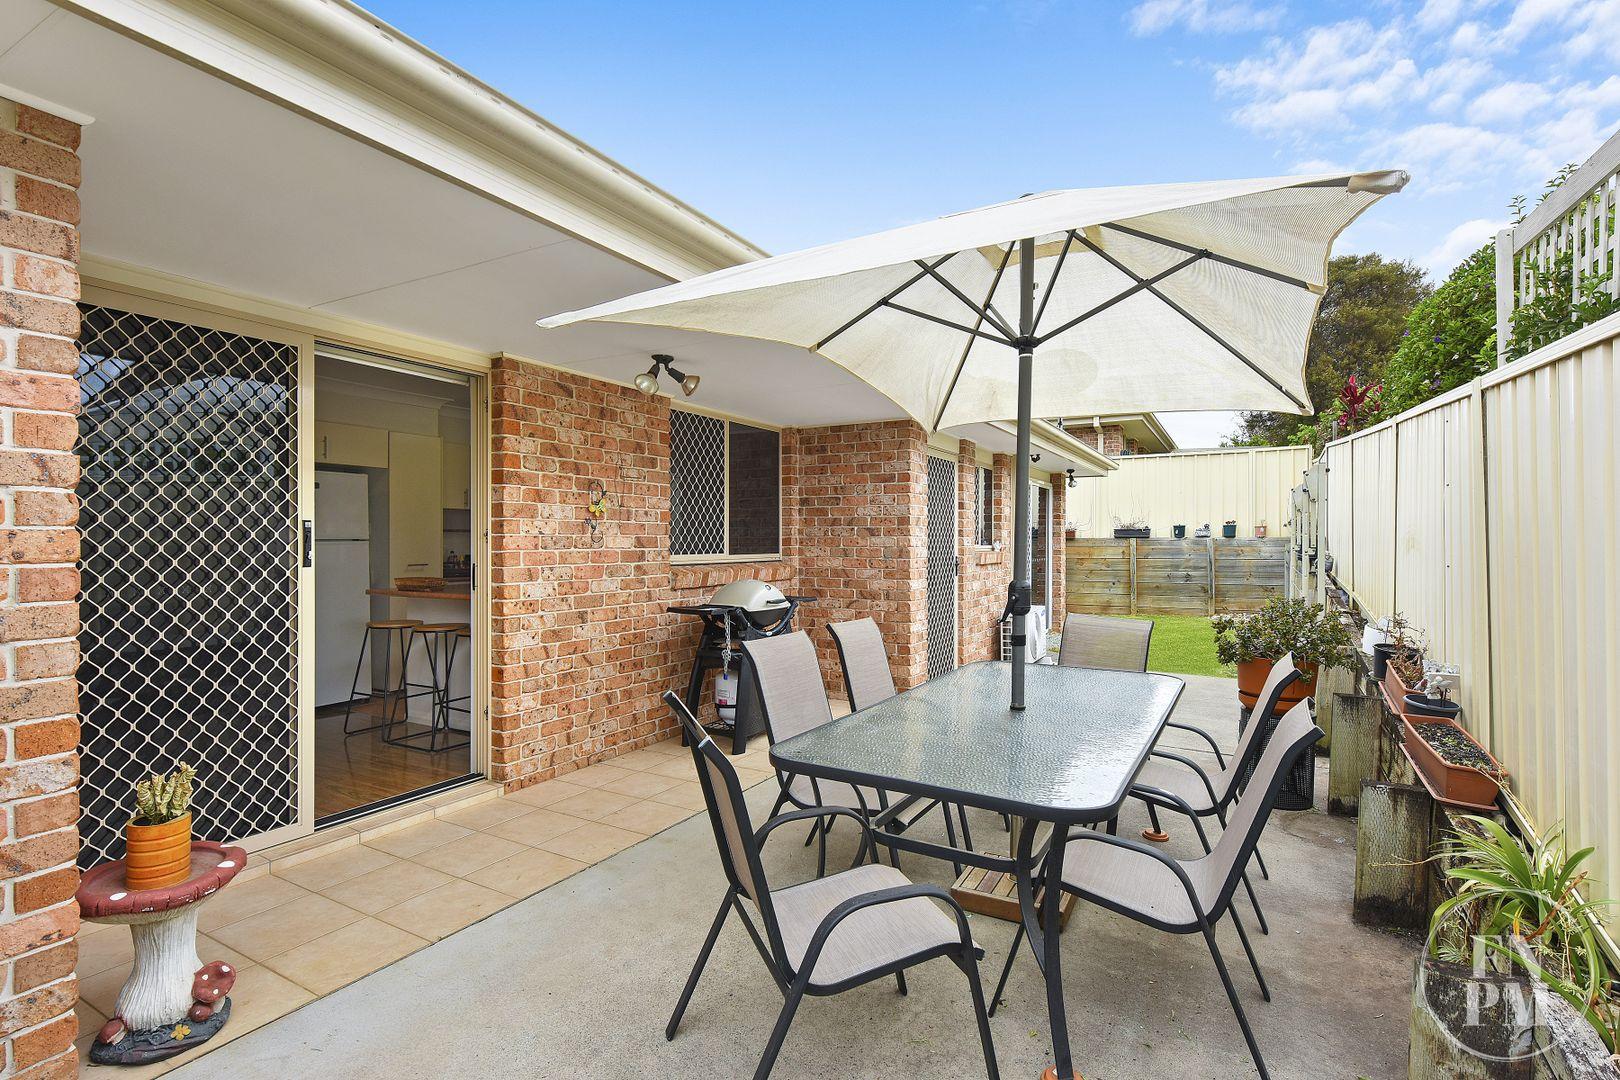 1/9 Squires Terrace, Port Macquarie NSW 2444, Image 0